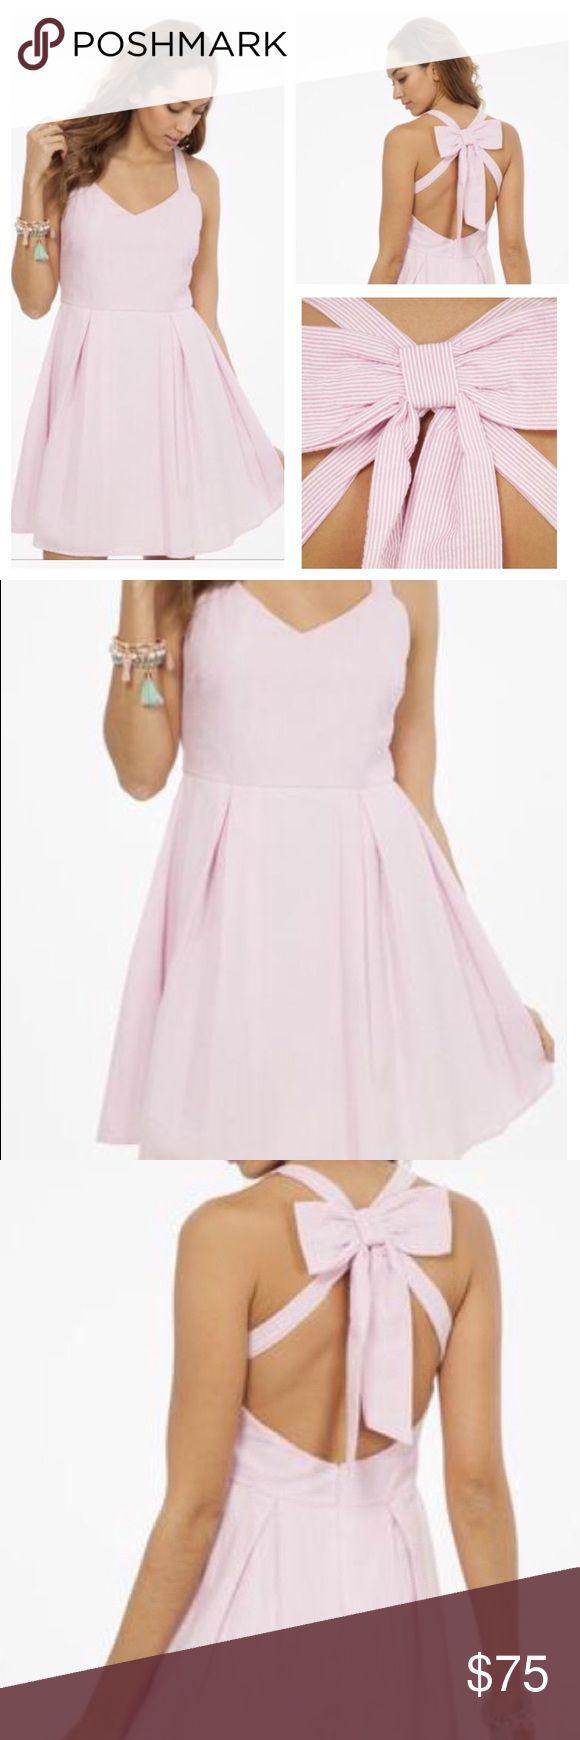 1000  ideas about Seersucker Dress on Pinterest  Seersucker ...